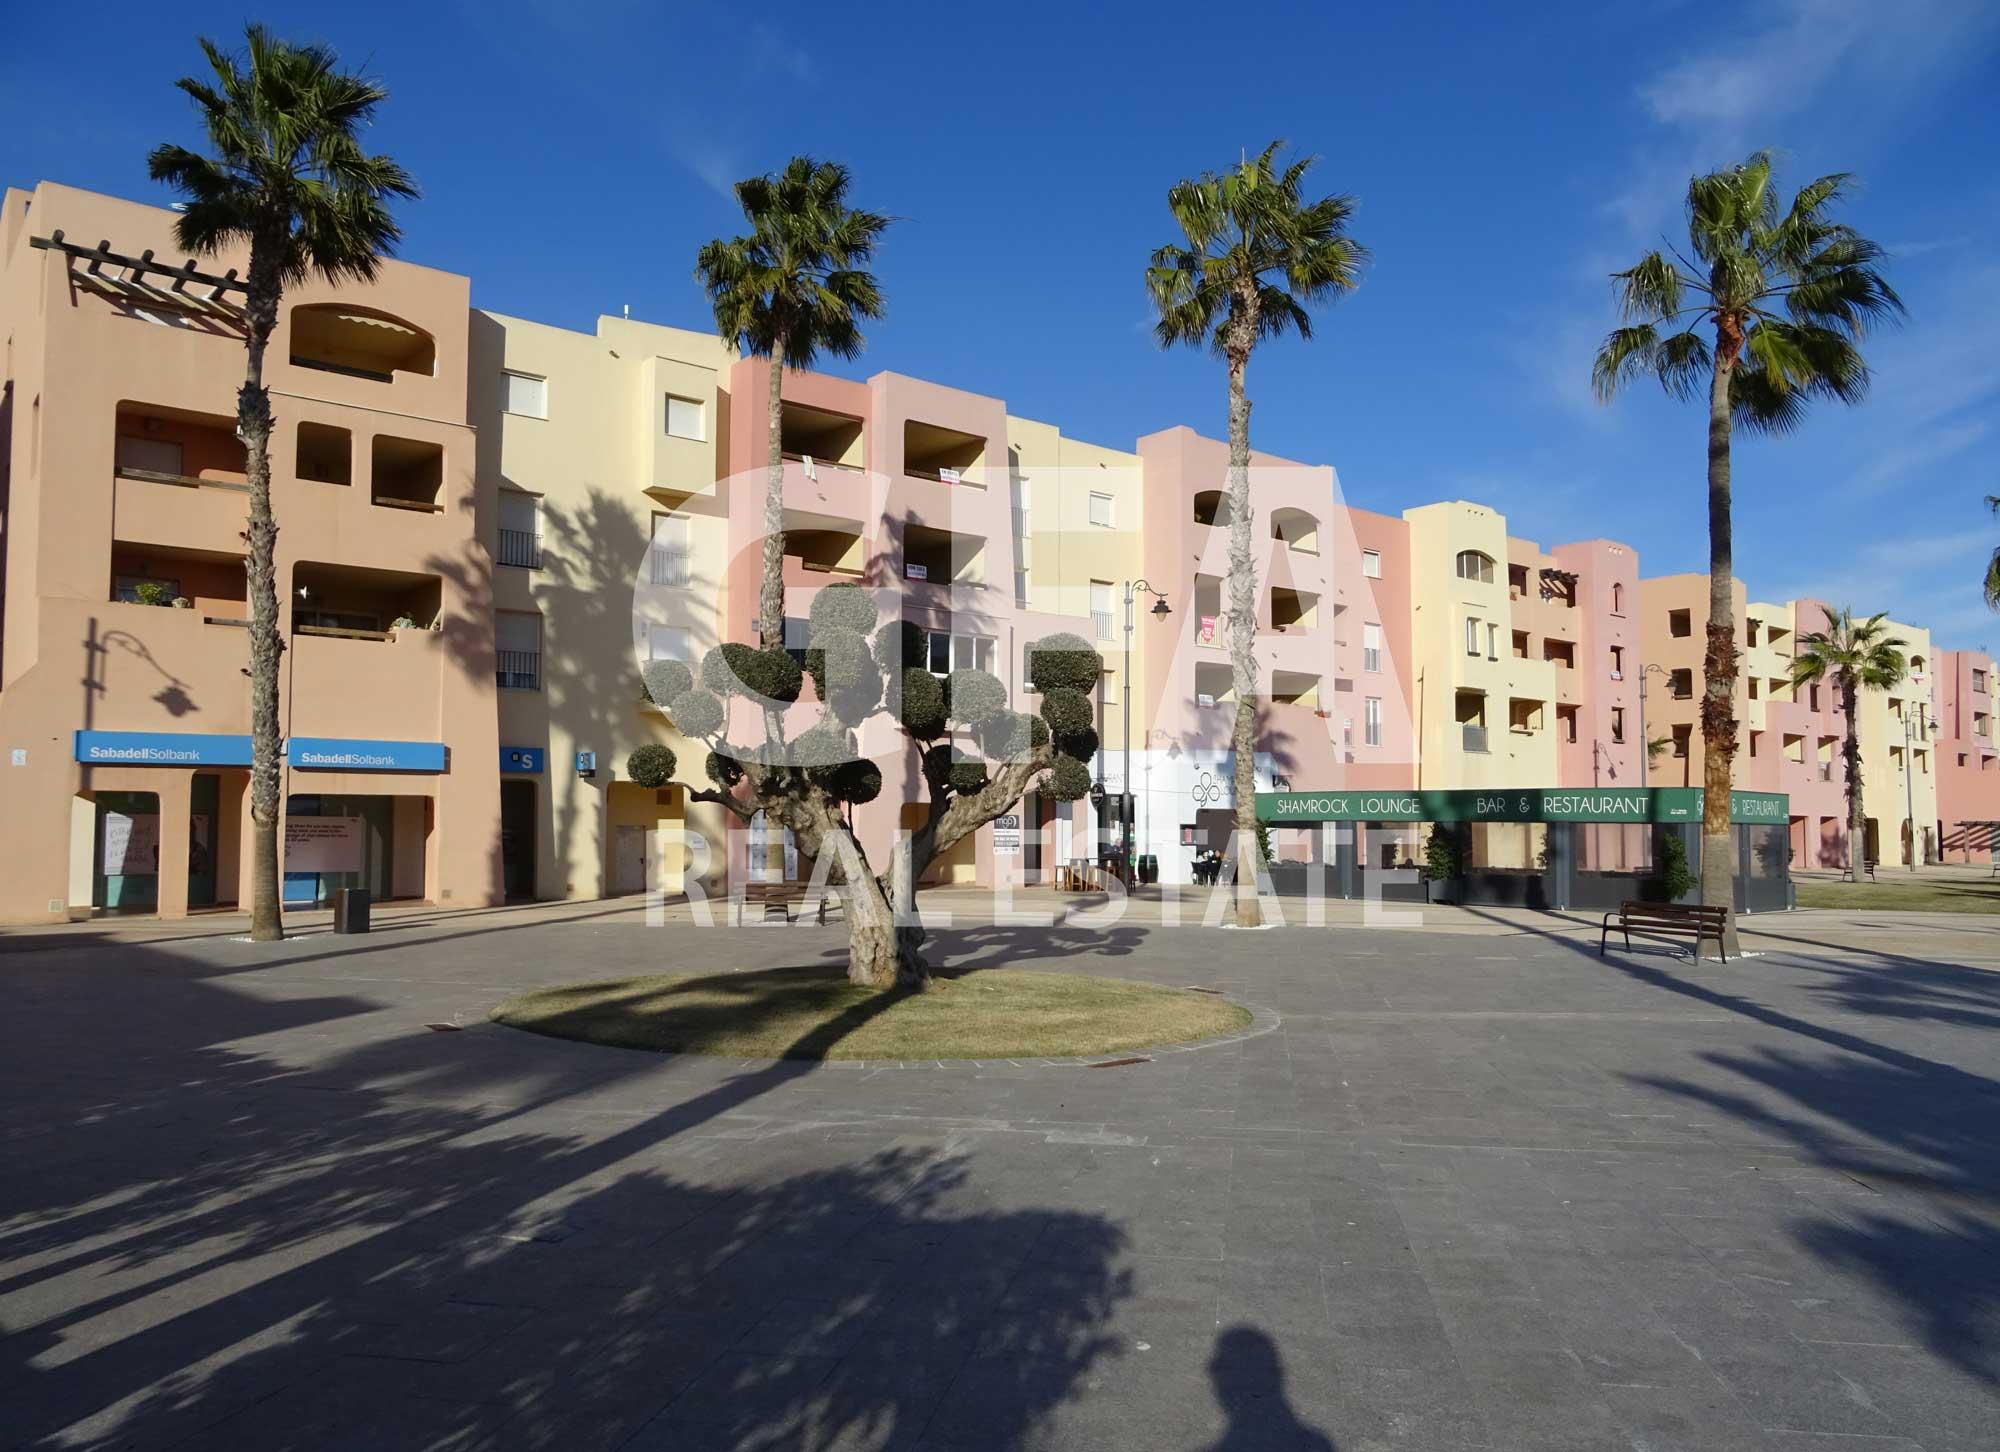 boulevard-viviendas-de-obra-nueva-resort-mar-menor (30)